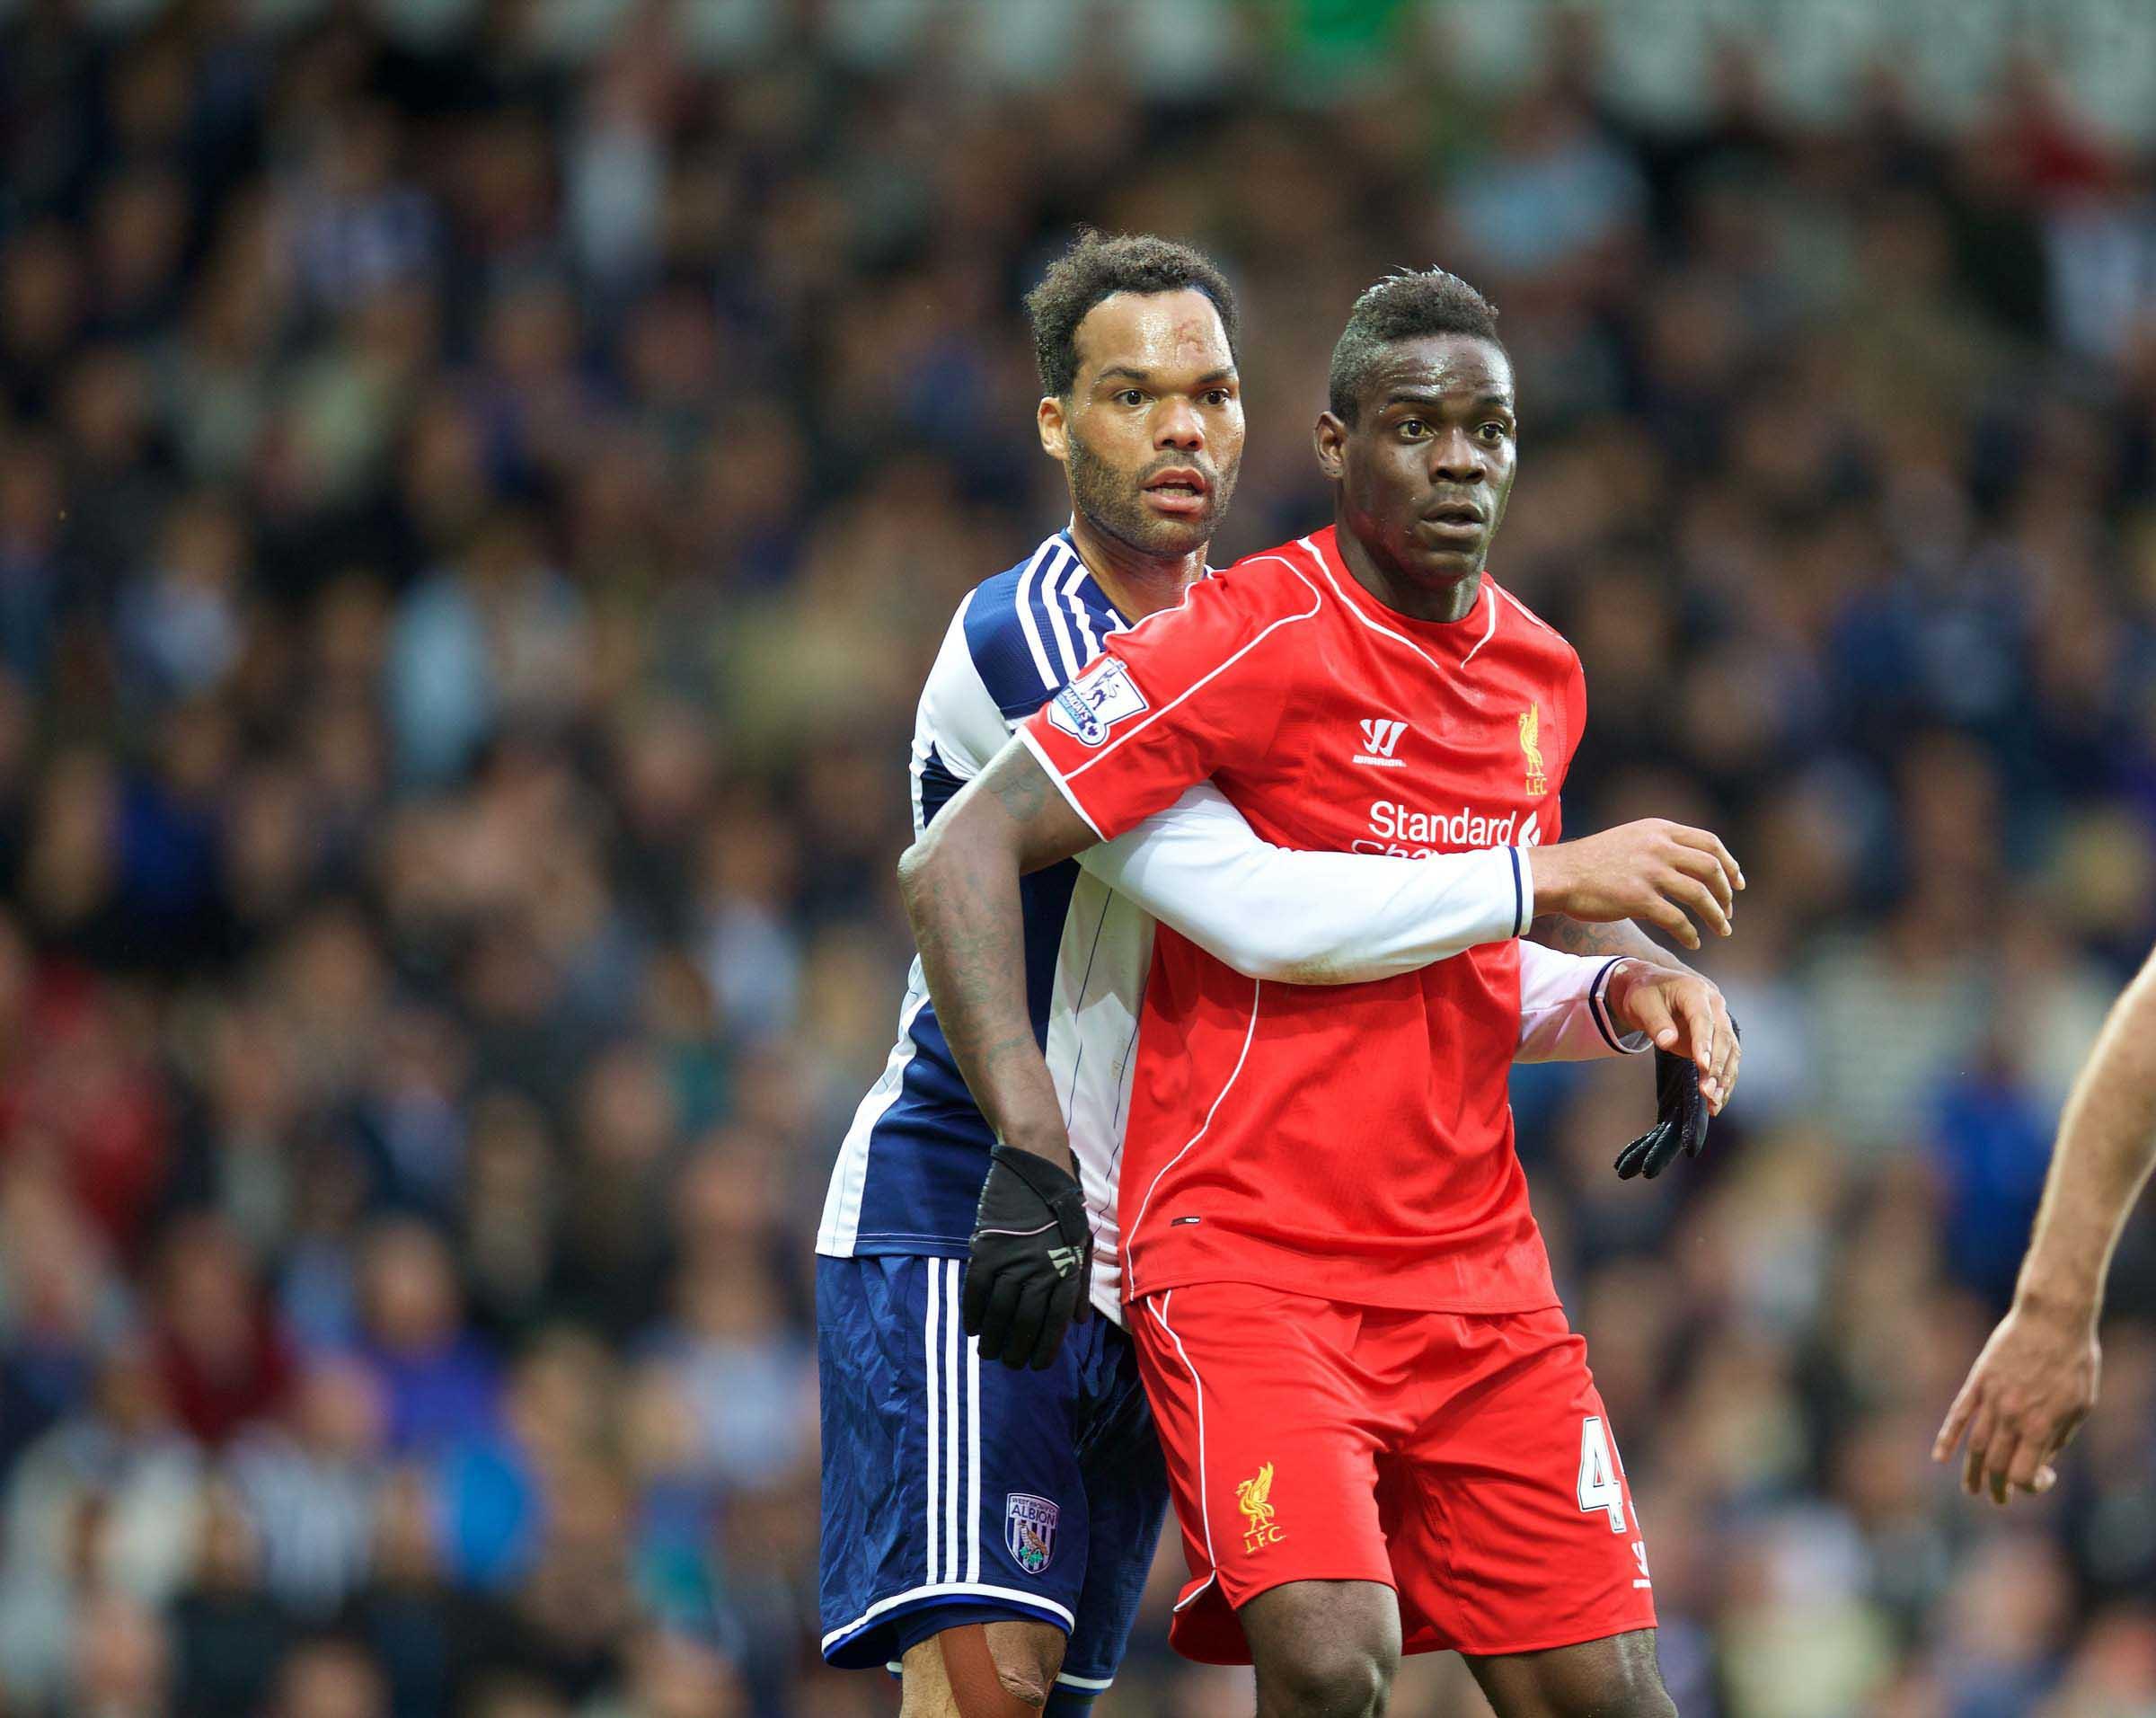 Football - FA Premier League - West Bromwich Albion FC v Liverpool FC